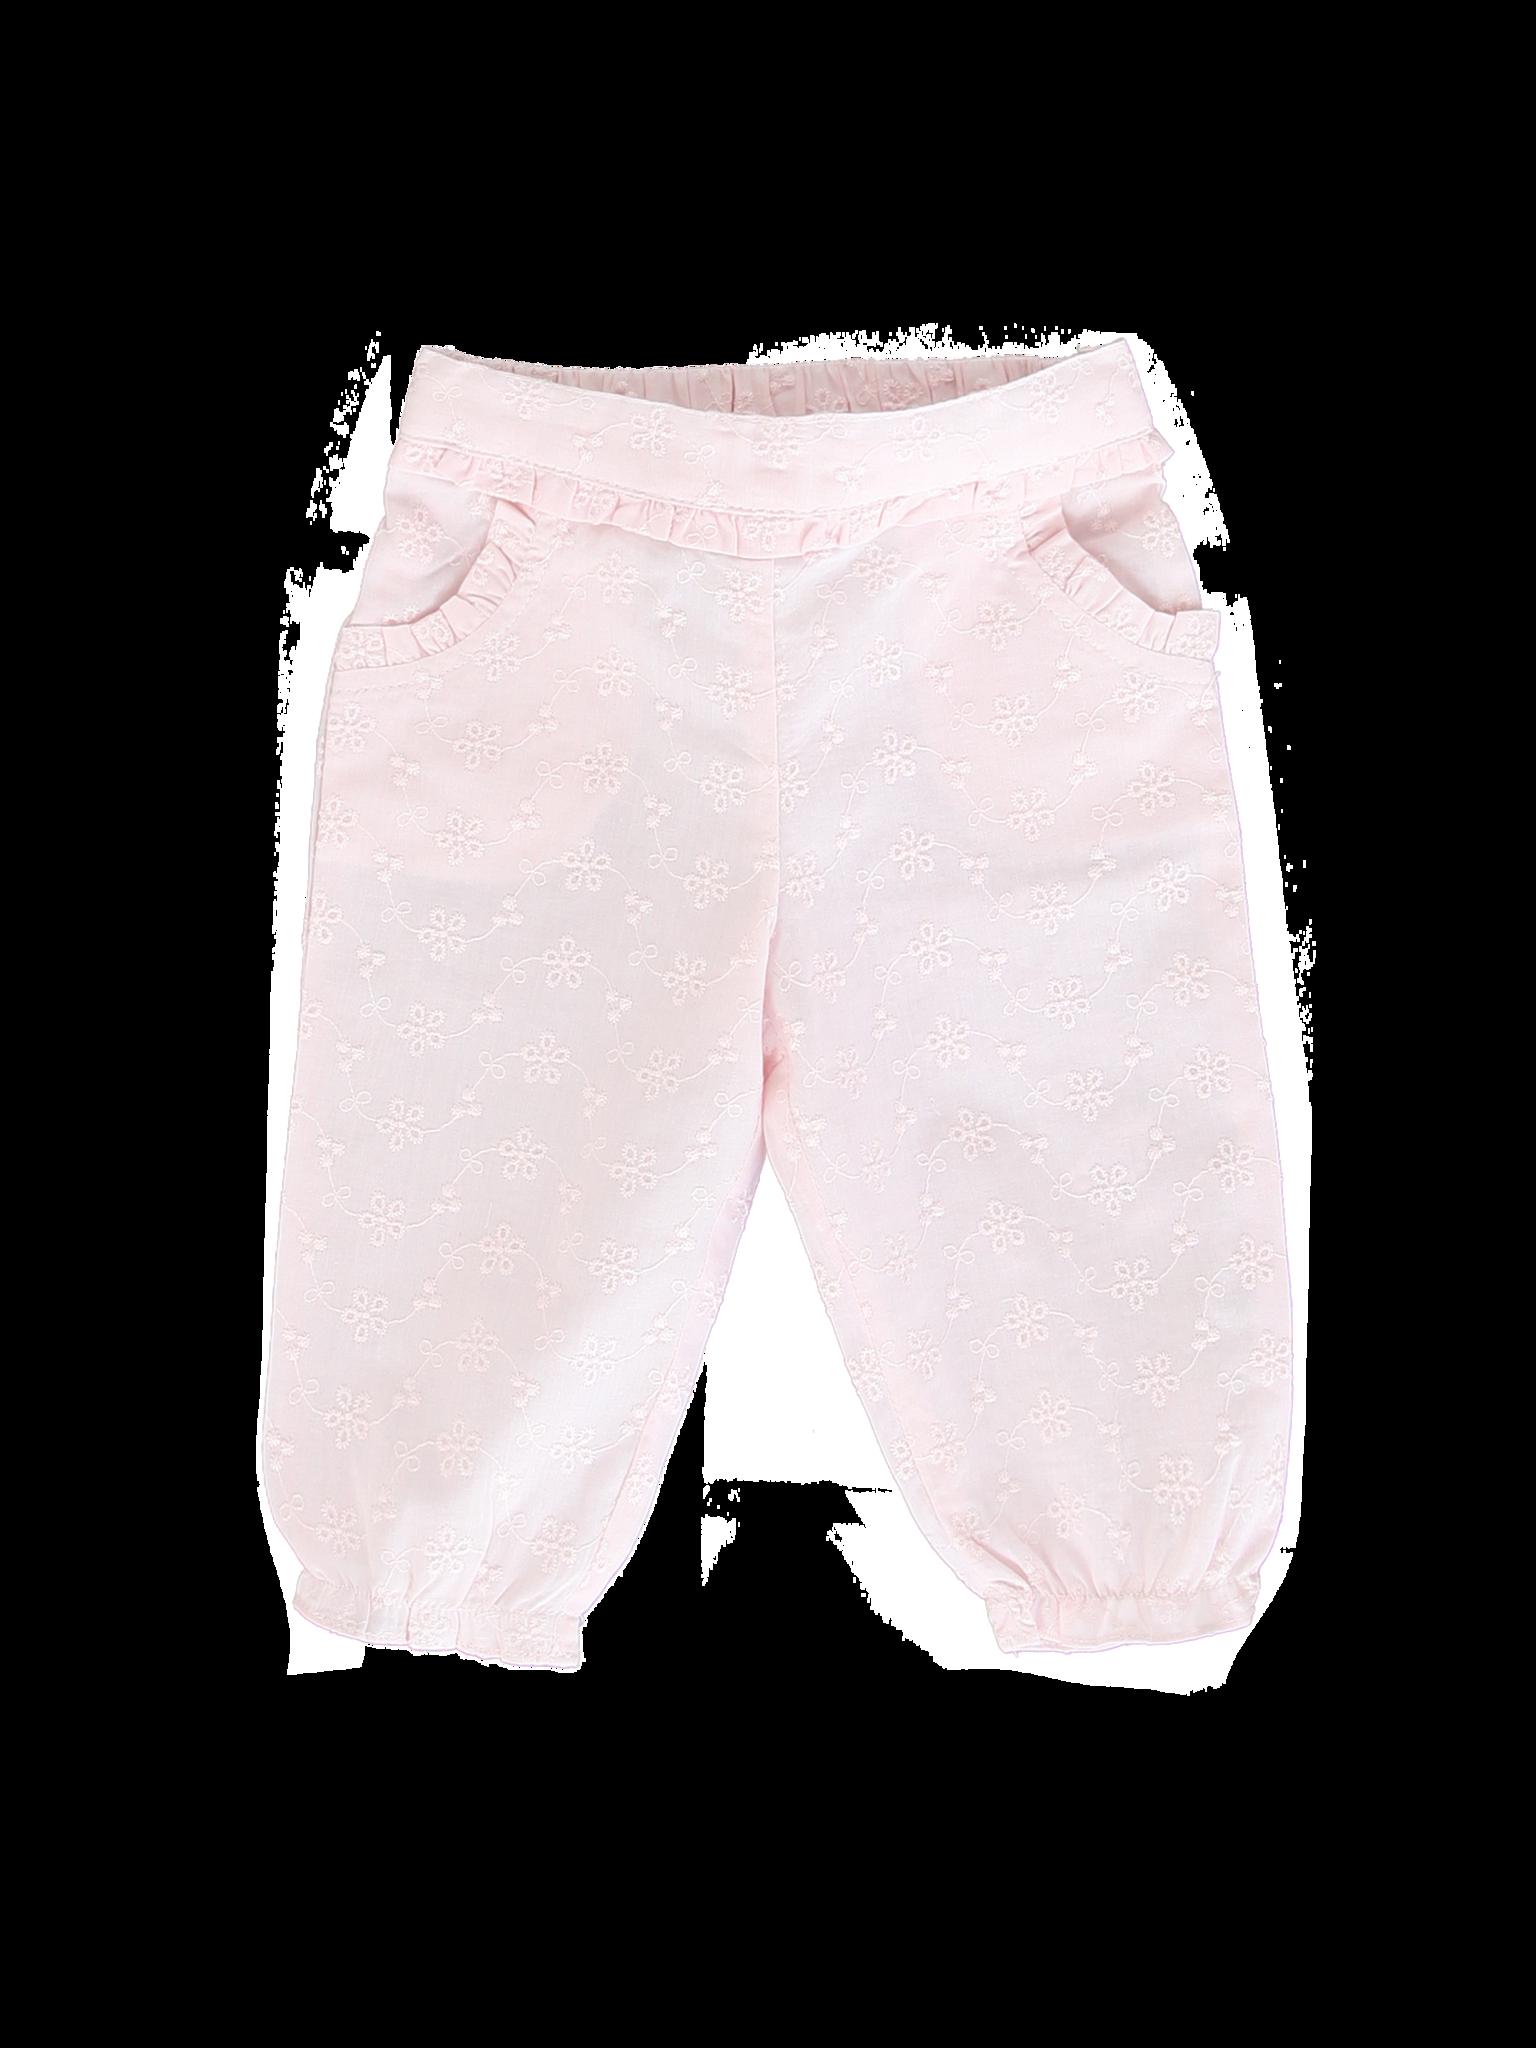 All Brands | Summerproducts Baby | Pants | 24 pcs/box